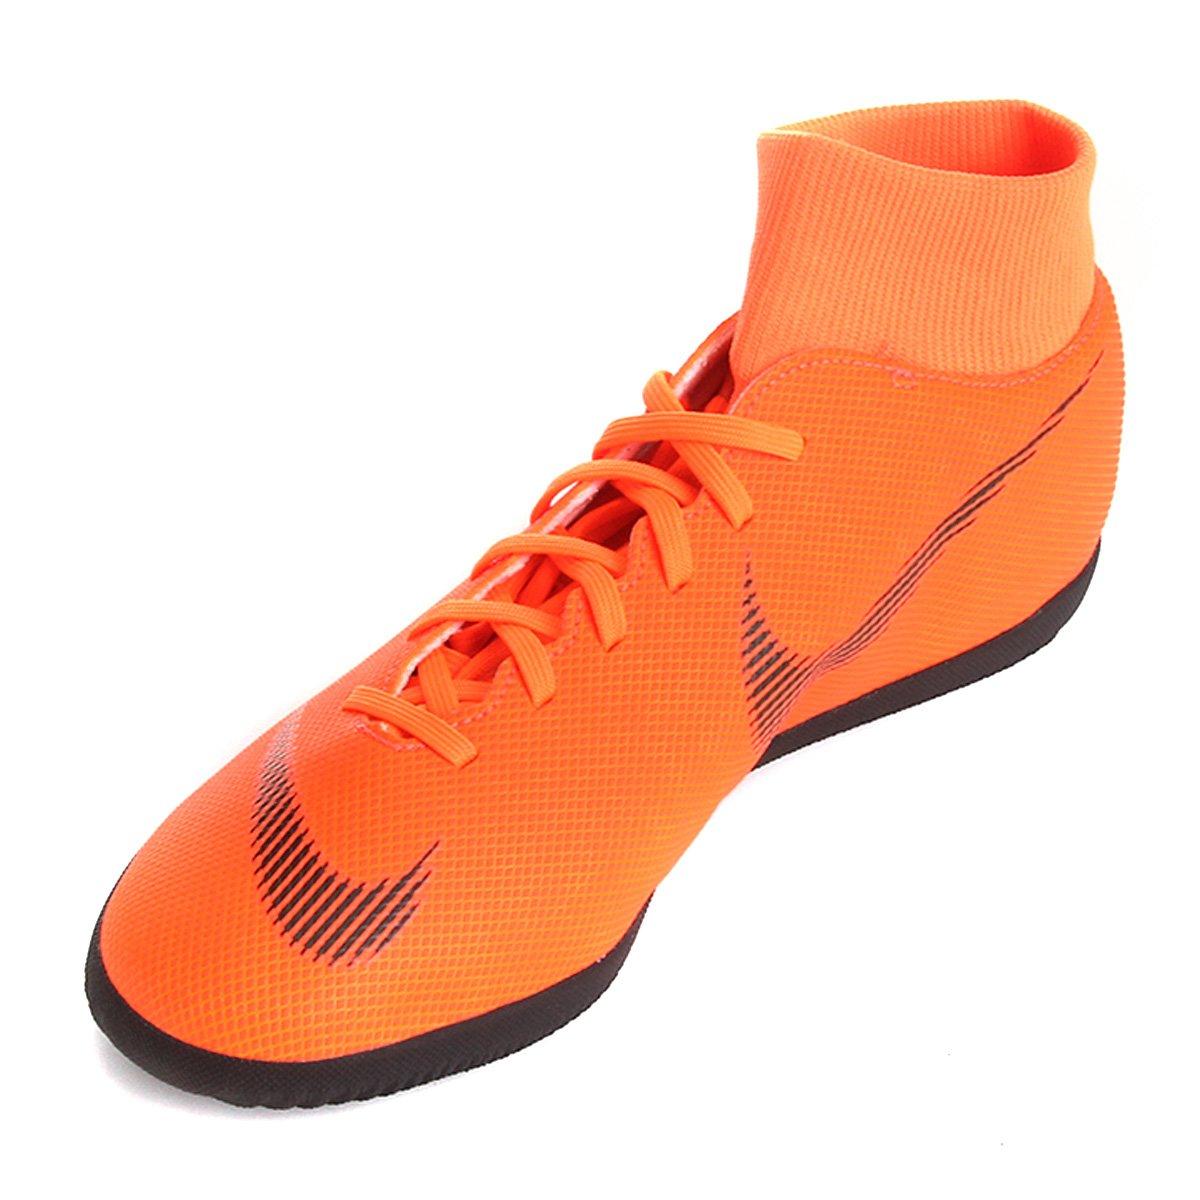 Chuteira Futsal Nike Mercurial Superfly 6 Club | Allianz